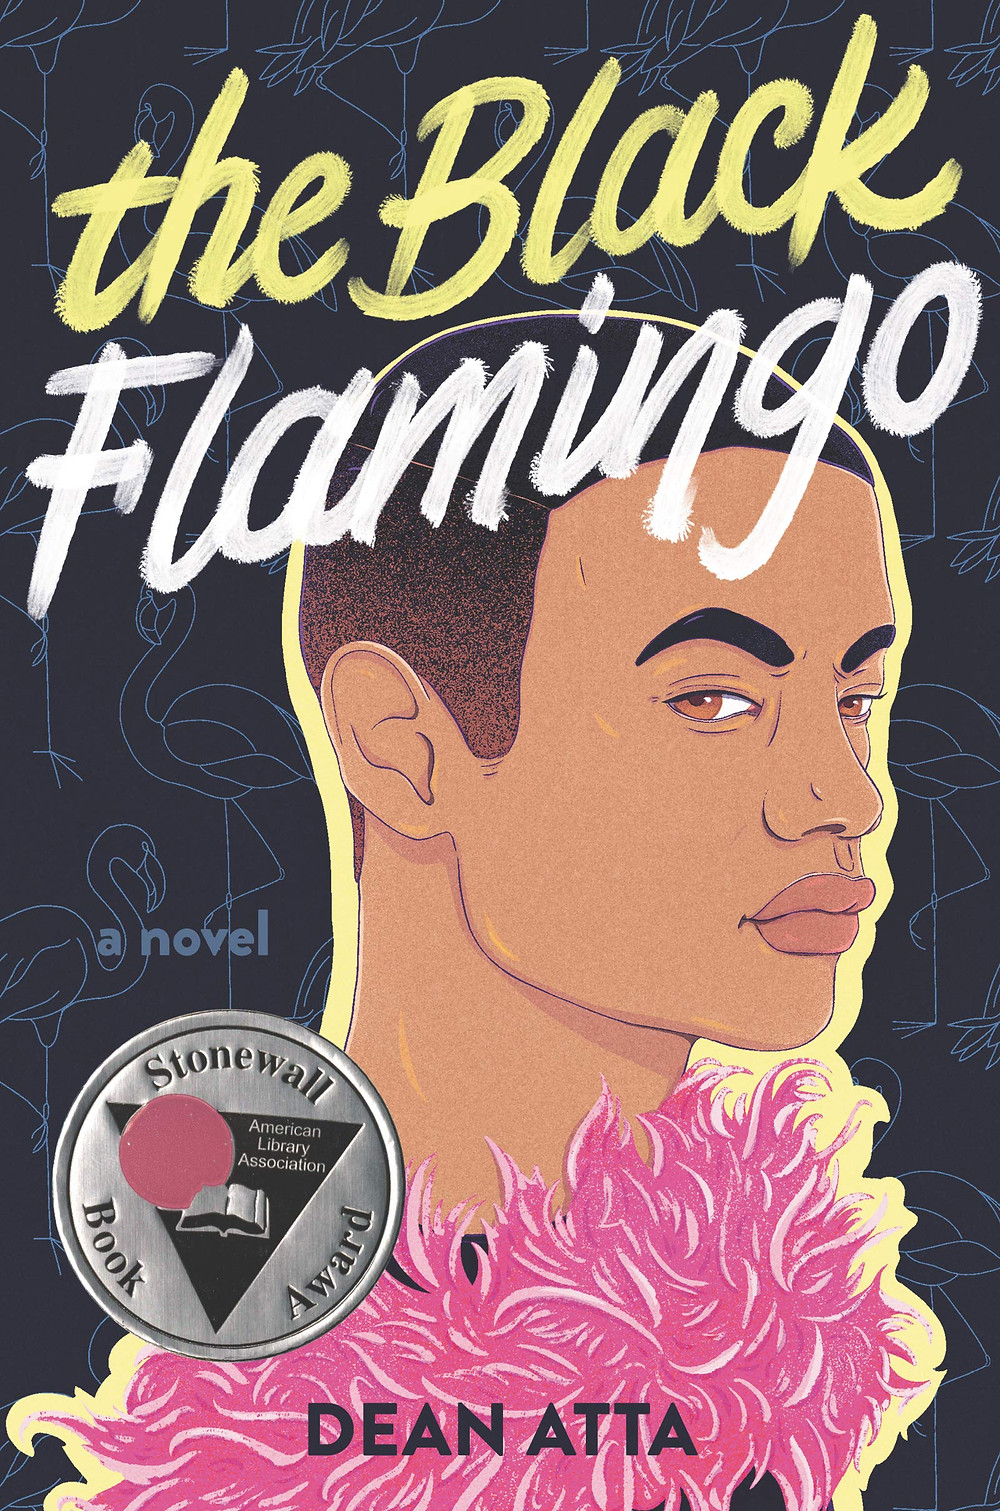 Book cover of The Black Flamingo by Dean Atta.